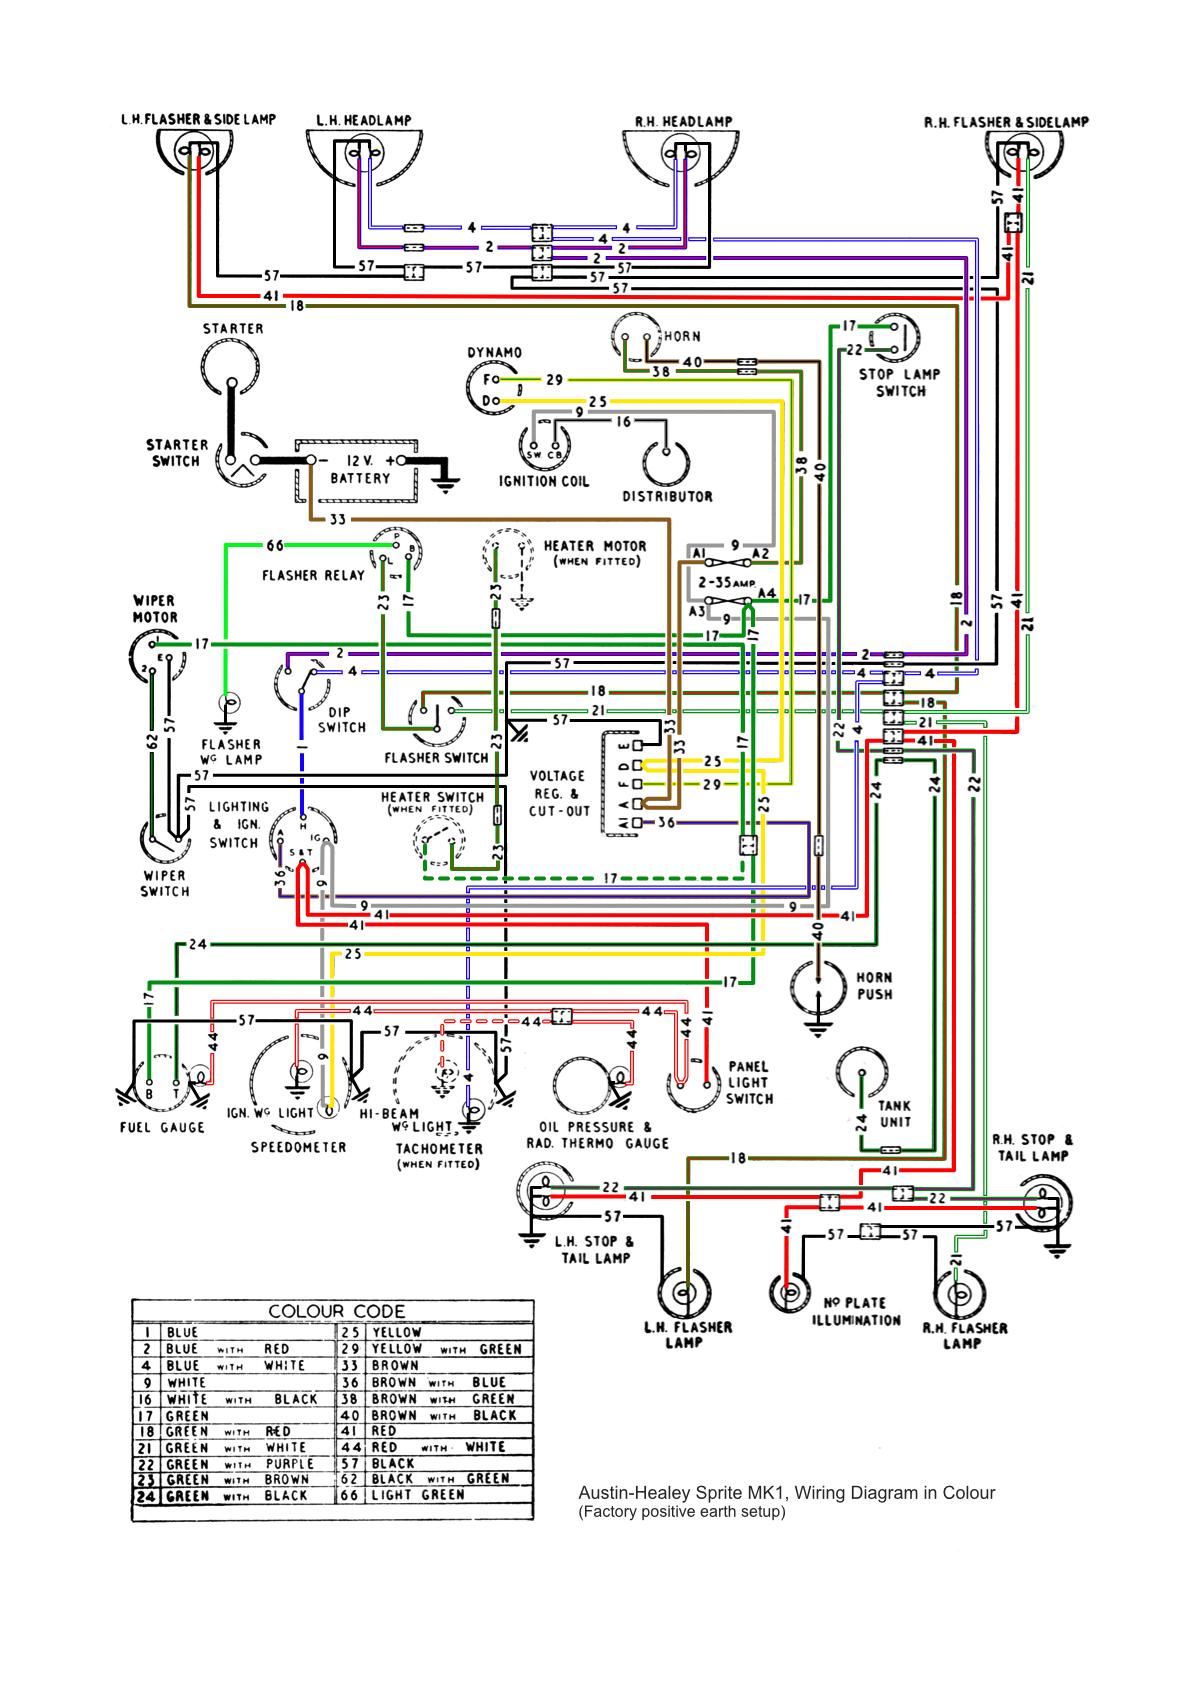 14731302990_7dab766701_o?resize\=665%2C941\&ssl\=1 vine banner wiring diagrams wiring diagrams vine thermostat wiring diagram at readyjetset.co